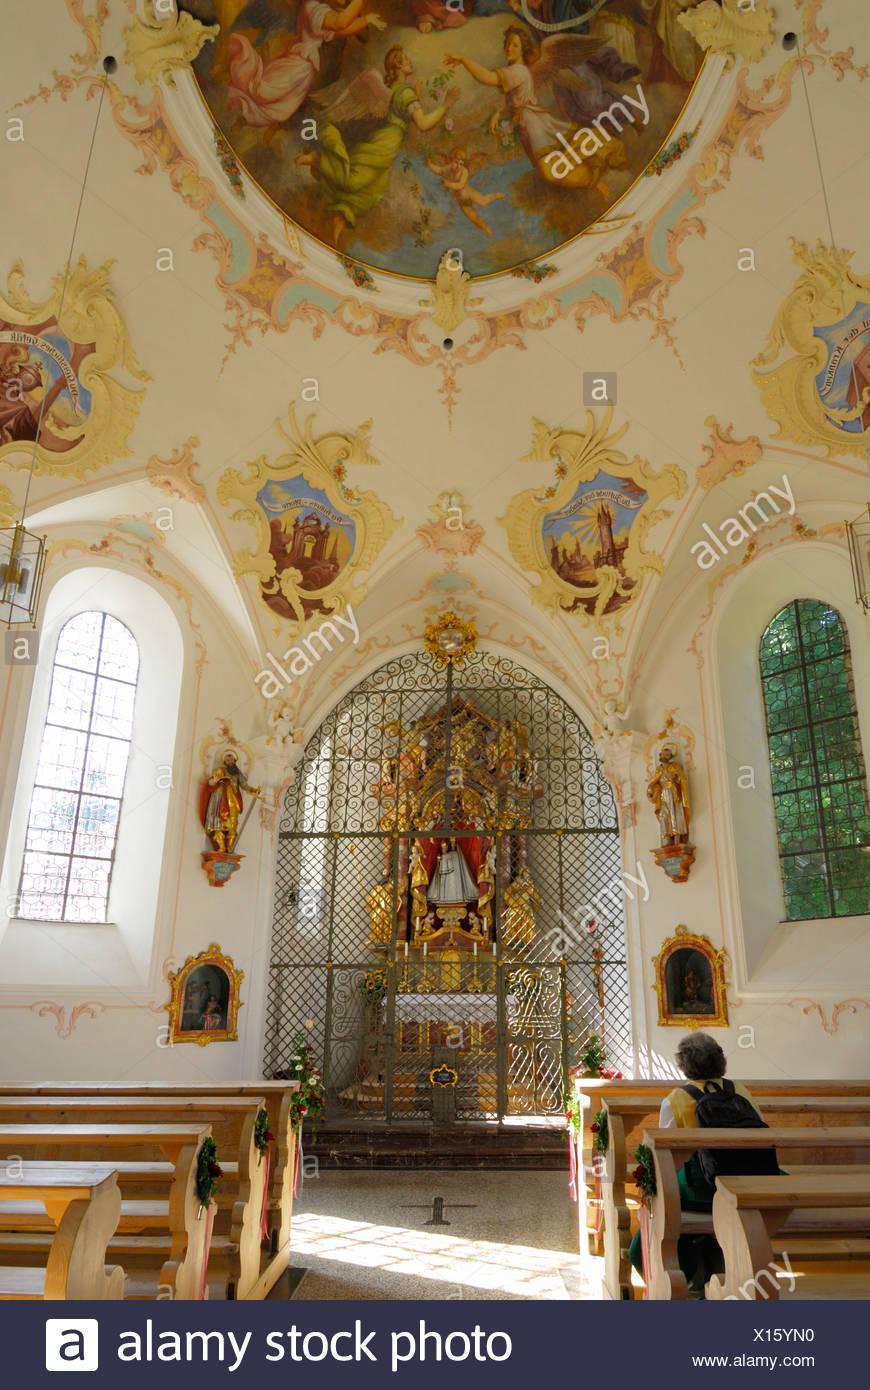 chapell Lorettokapelle, pilgrimage chapell, interior view, Oberstdorf, Allgaeu range, Allgaeu, Swabia, Bavaria, Germany - Stock Image